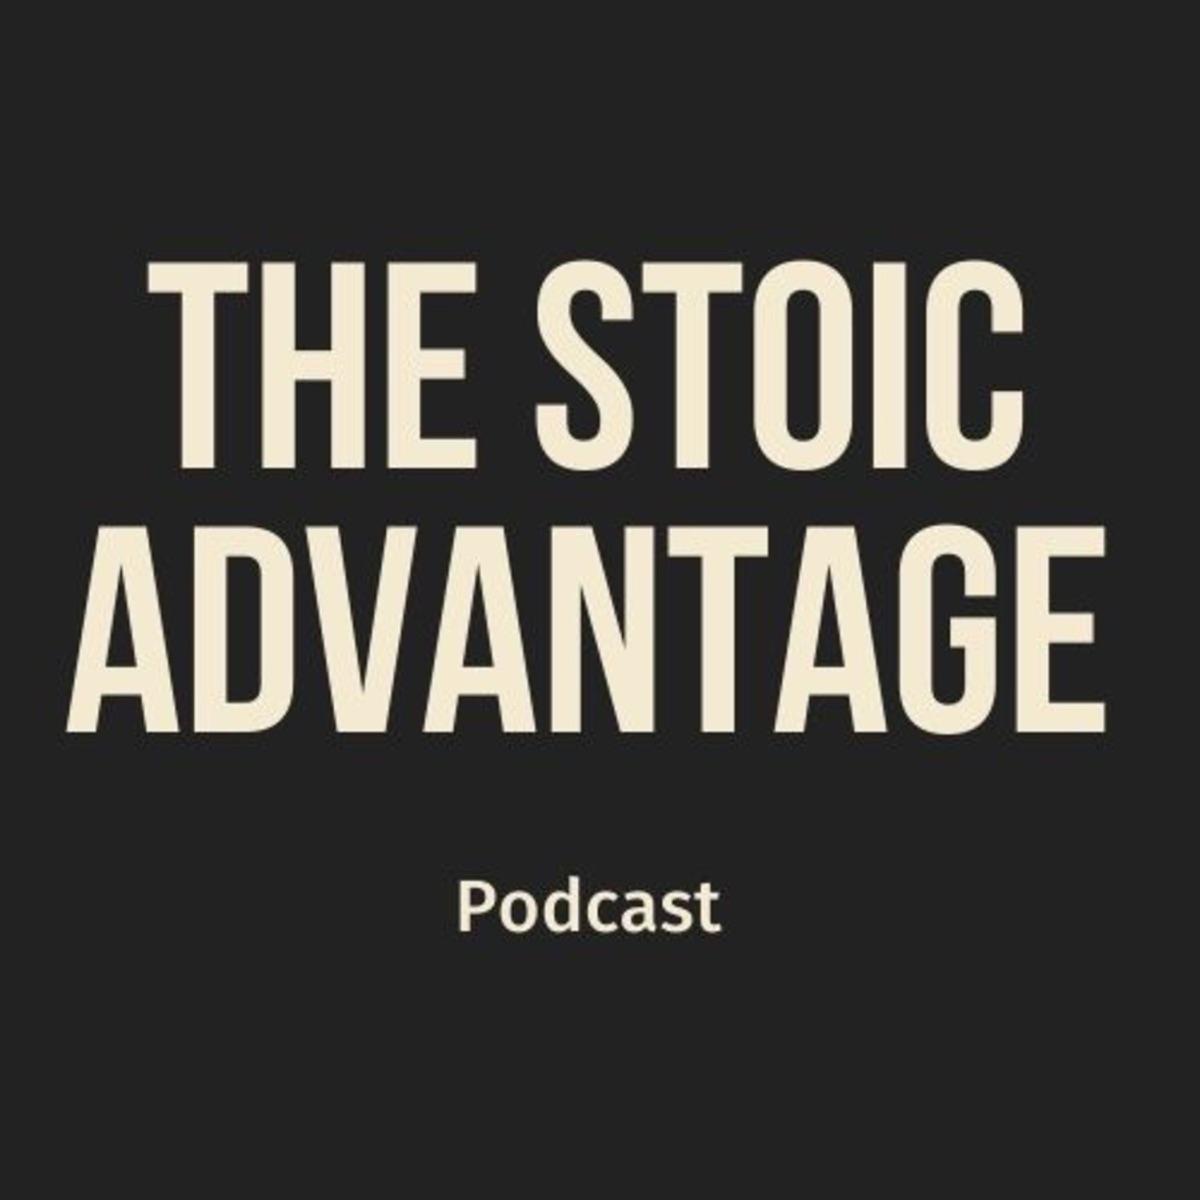 The Stoic Advantage